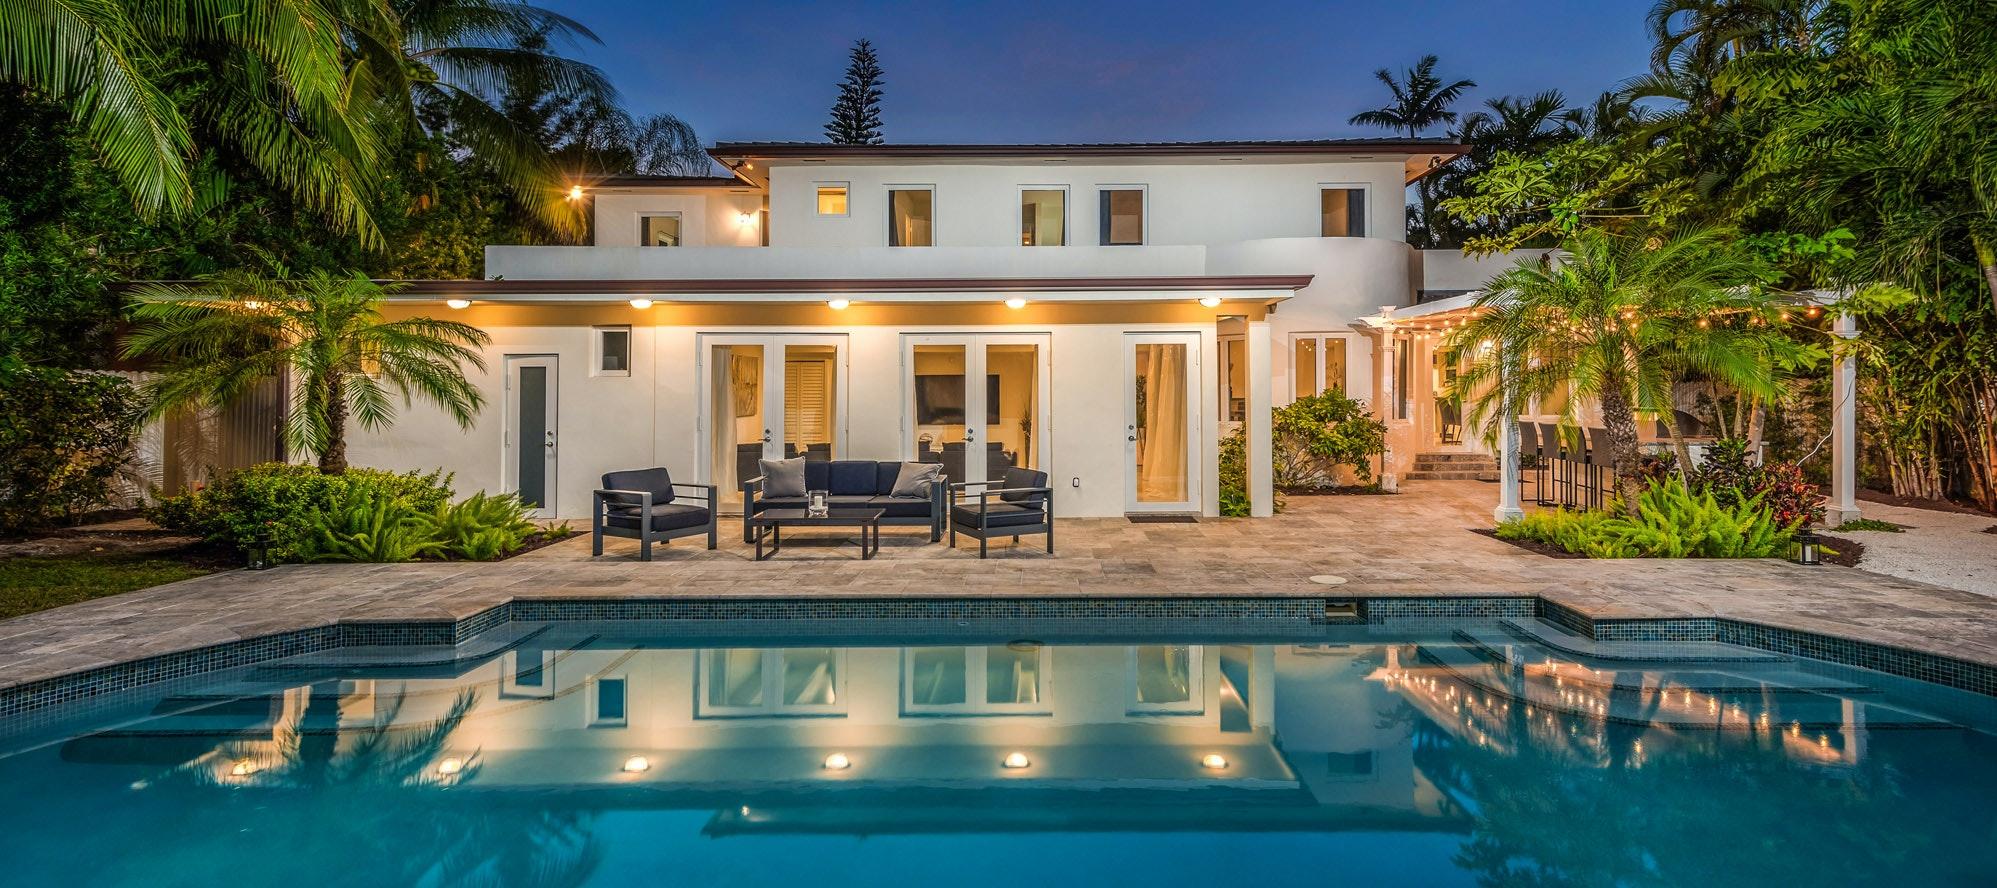 Villa Colada luxury rental in Brickell